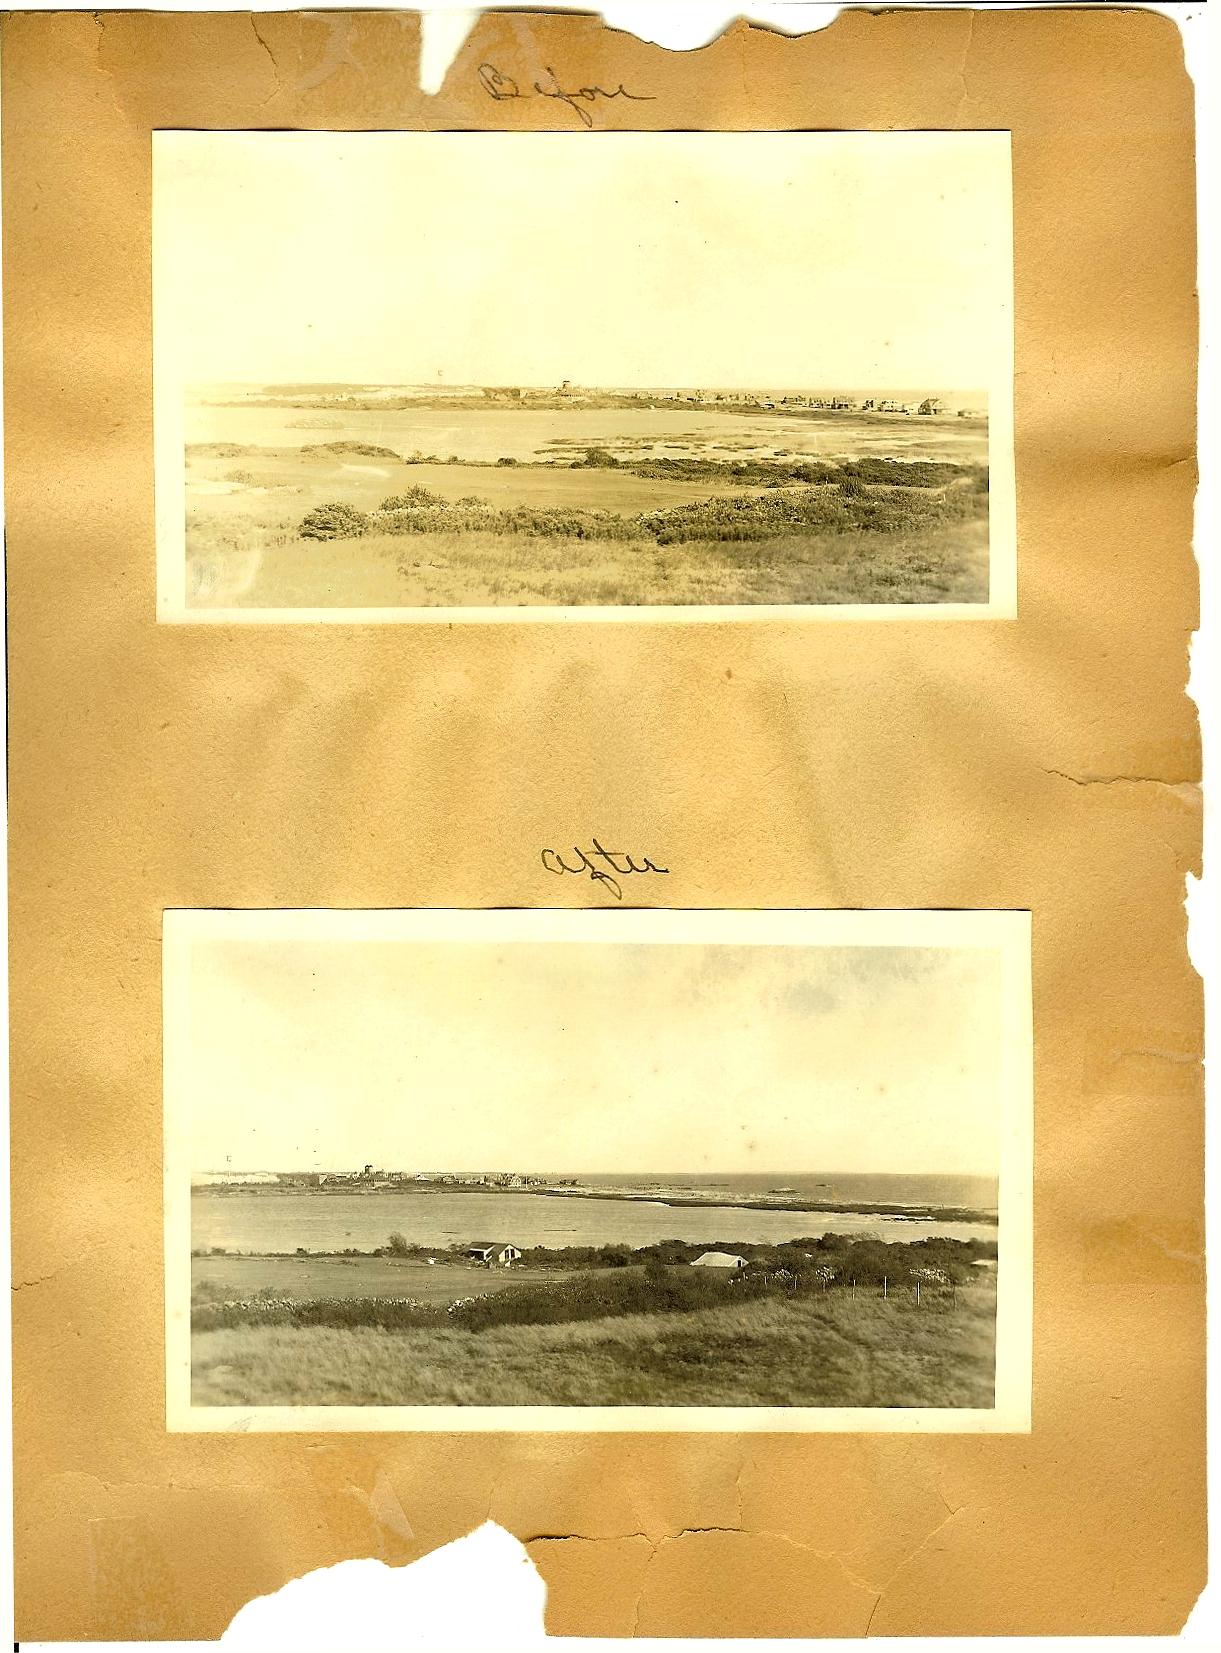 The 1938 Hurricane photos p23